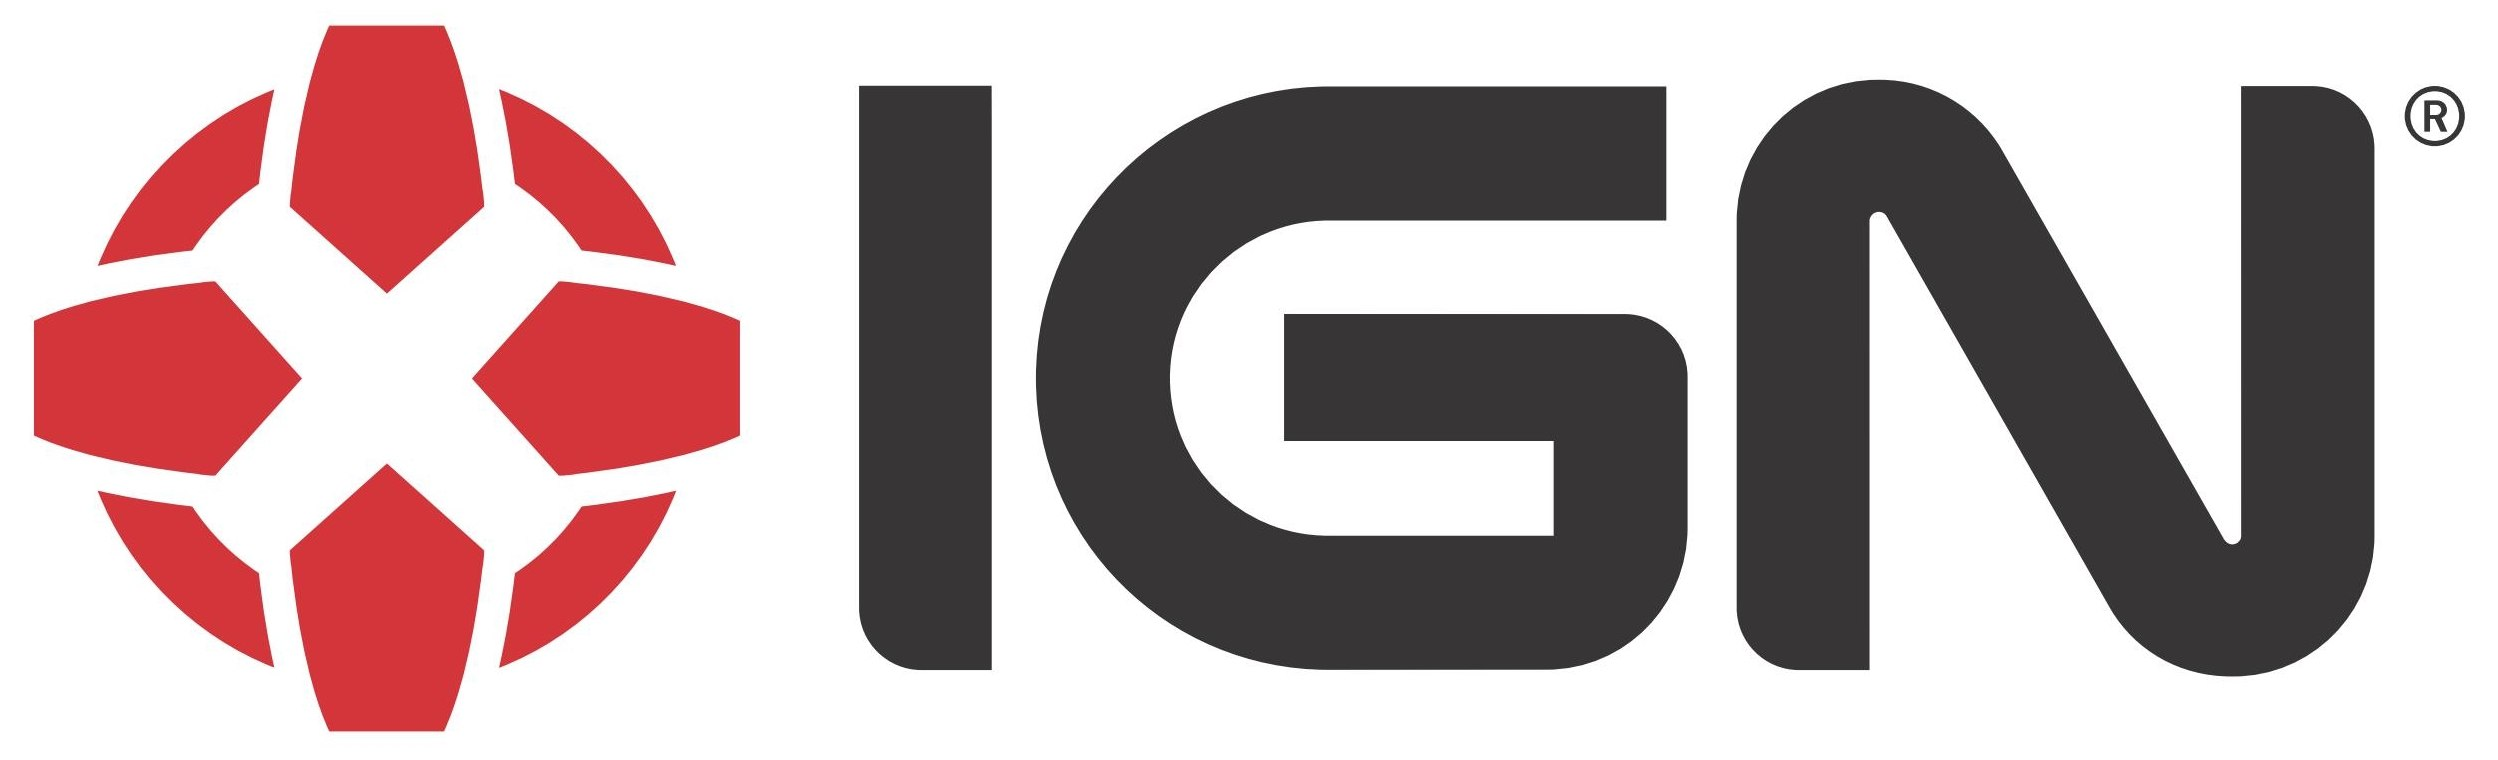 ign imagine games network logo eps file vector eps free rh freelogovectors net image entertainment logo imagine entertainment logo hd